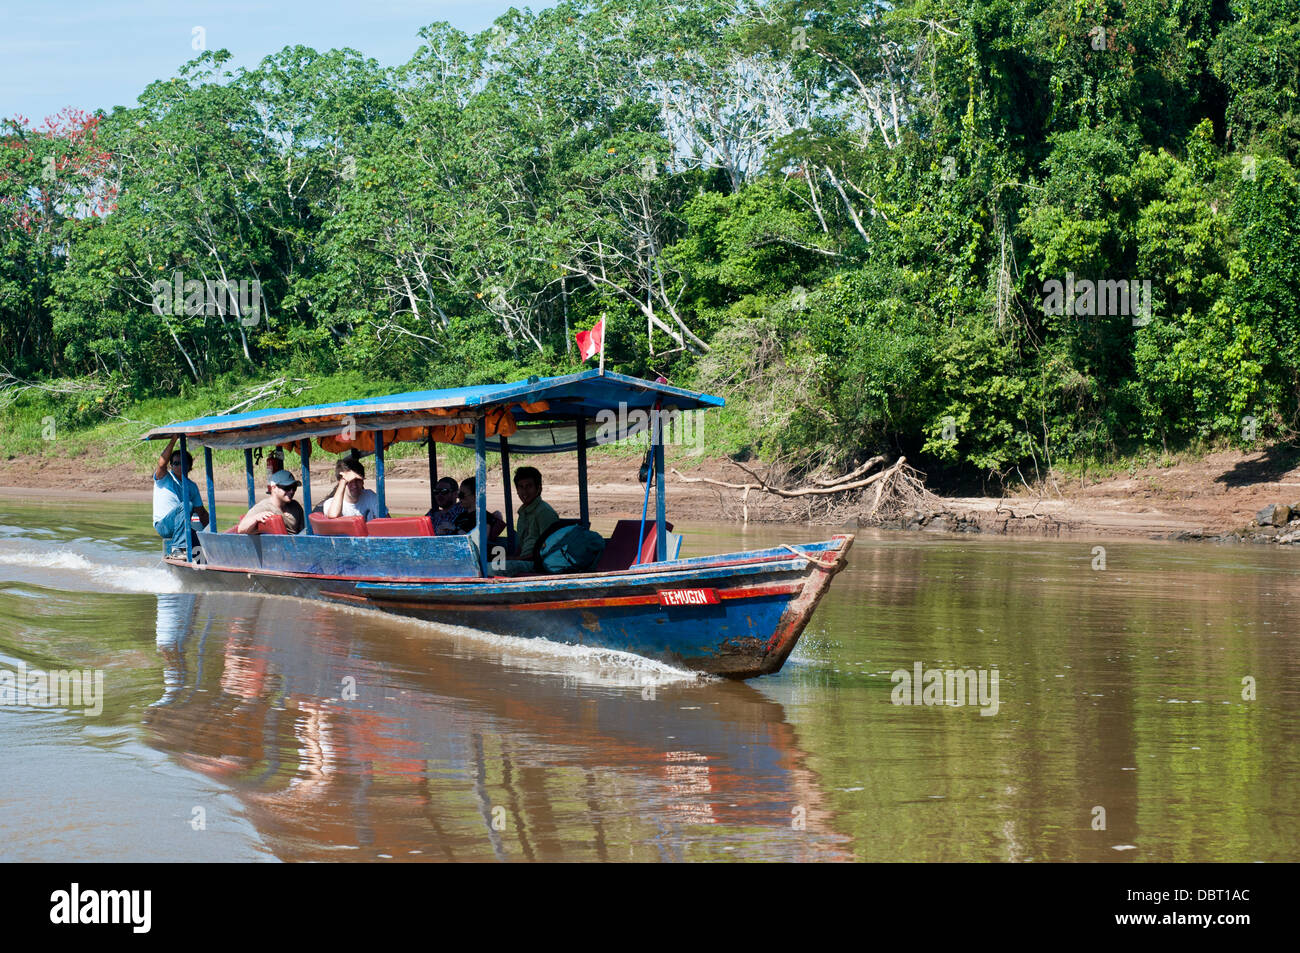 Peruvian riverboat transporting tourists on the Tambopata River near Puerto Maldonaldo Peru - Stock Image